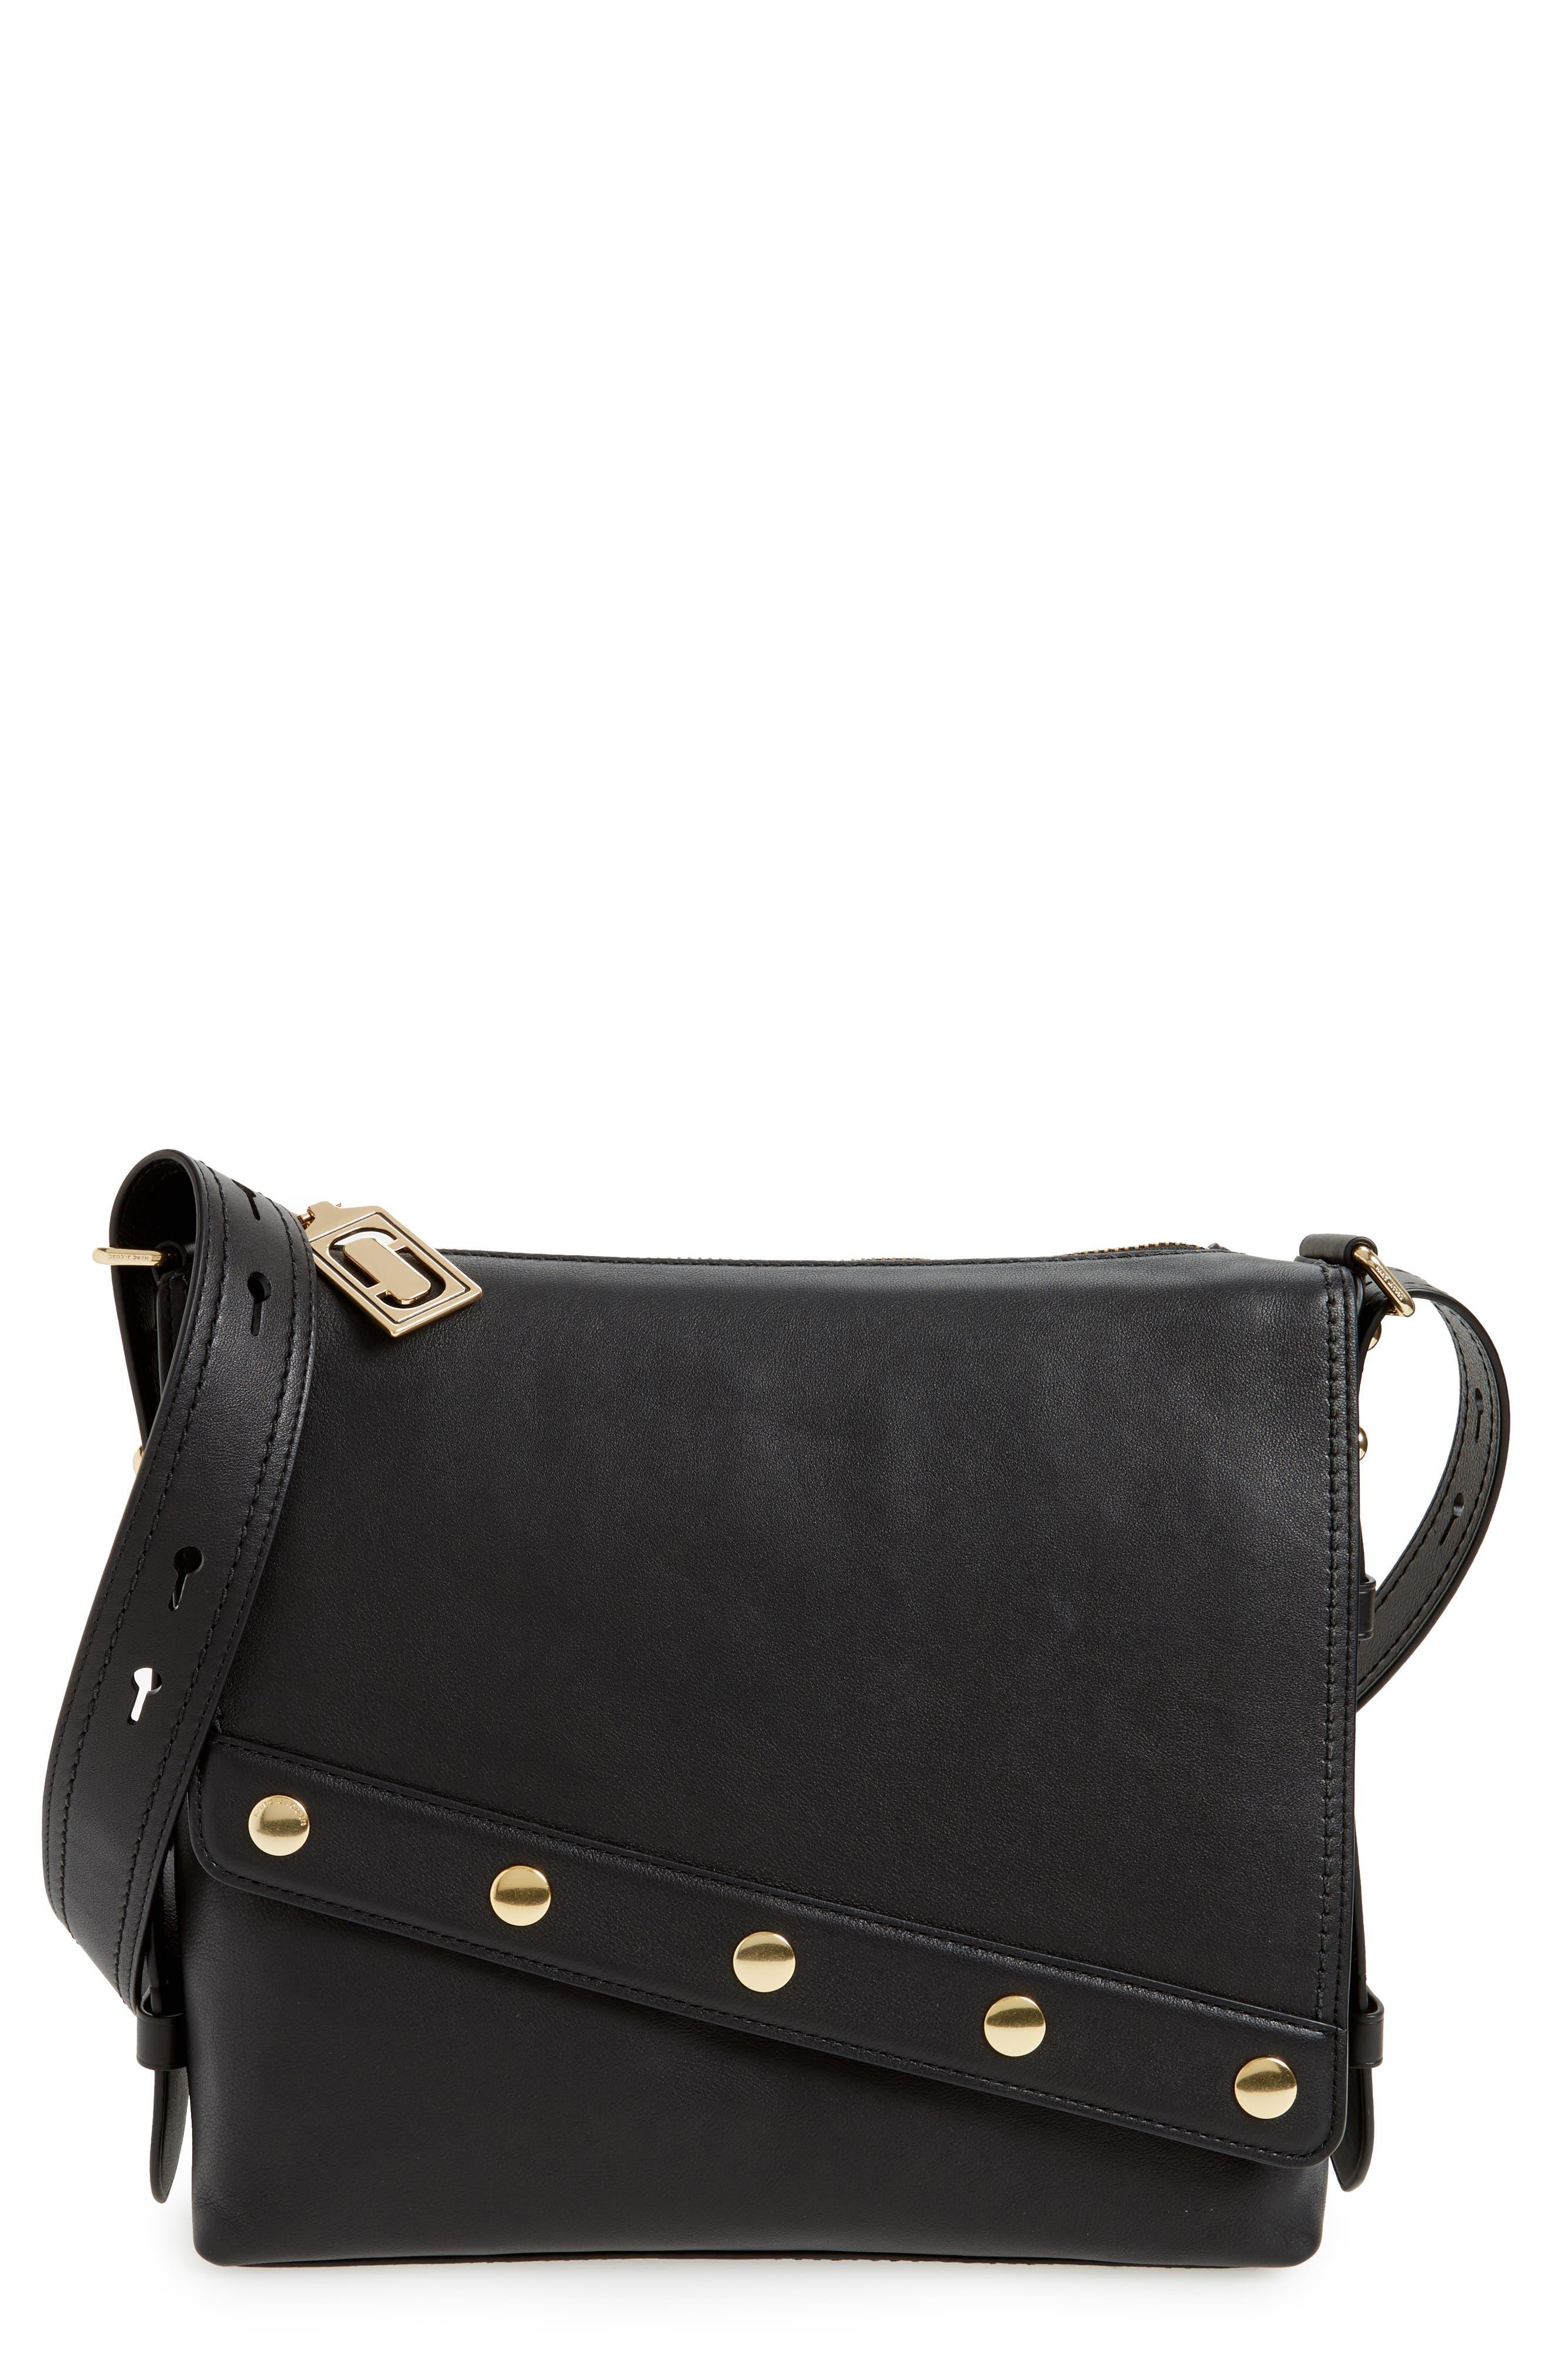 Main Image - MARC JACOBS Downtown Stud Leather Shoulder Bag